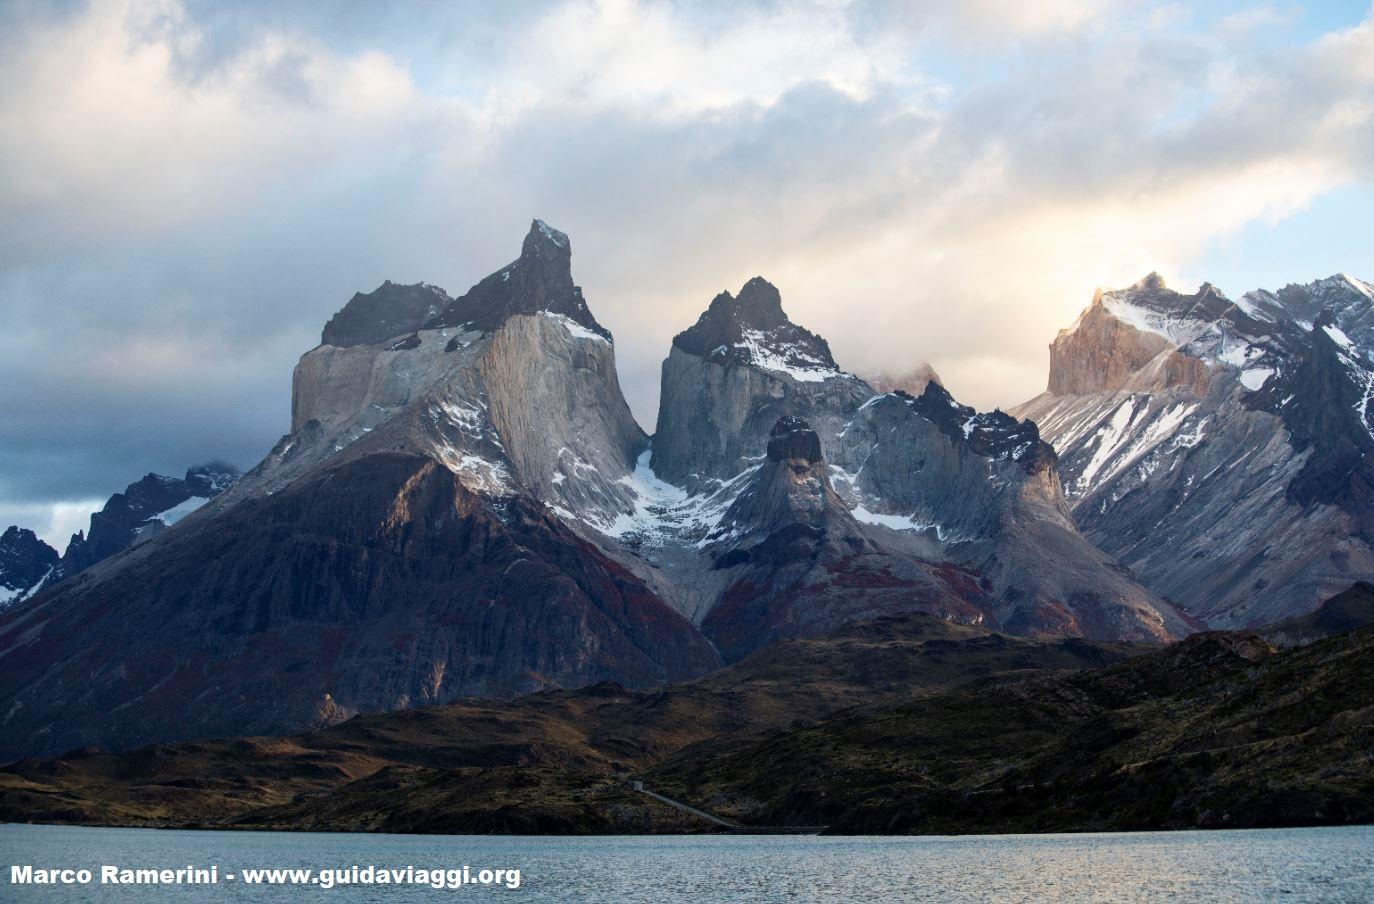 Viaggio fotografico in Patagonia. Cuernos del Paine, Parco Nazionale Torres del Paine, Cile. Autore e Copyright Marco Ramerini